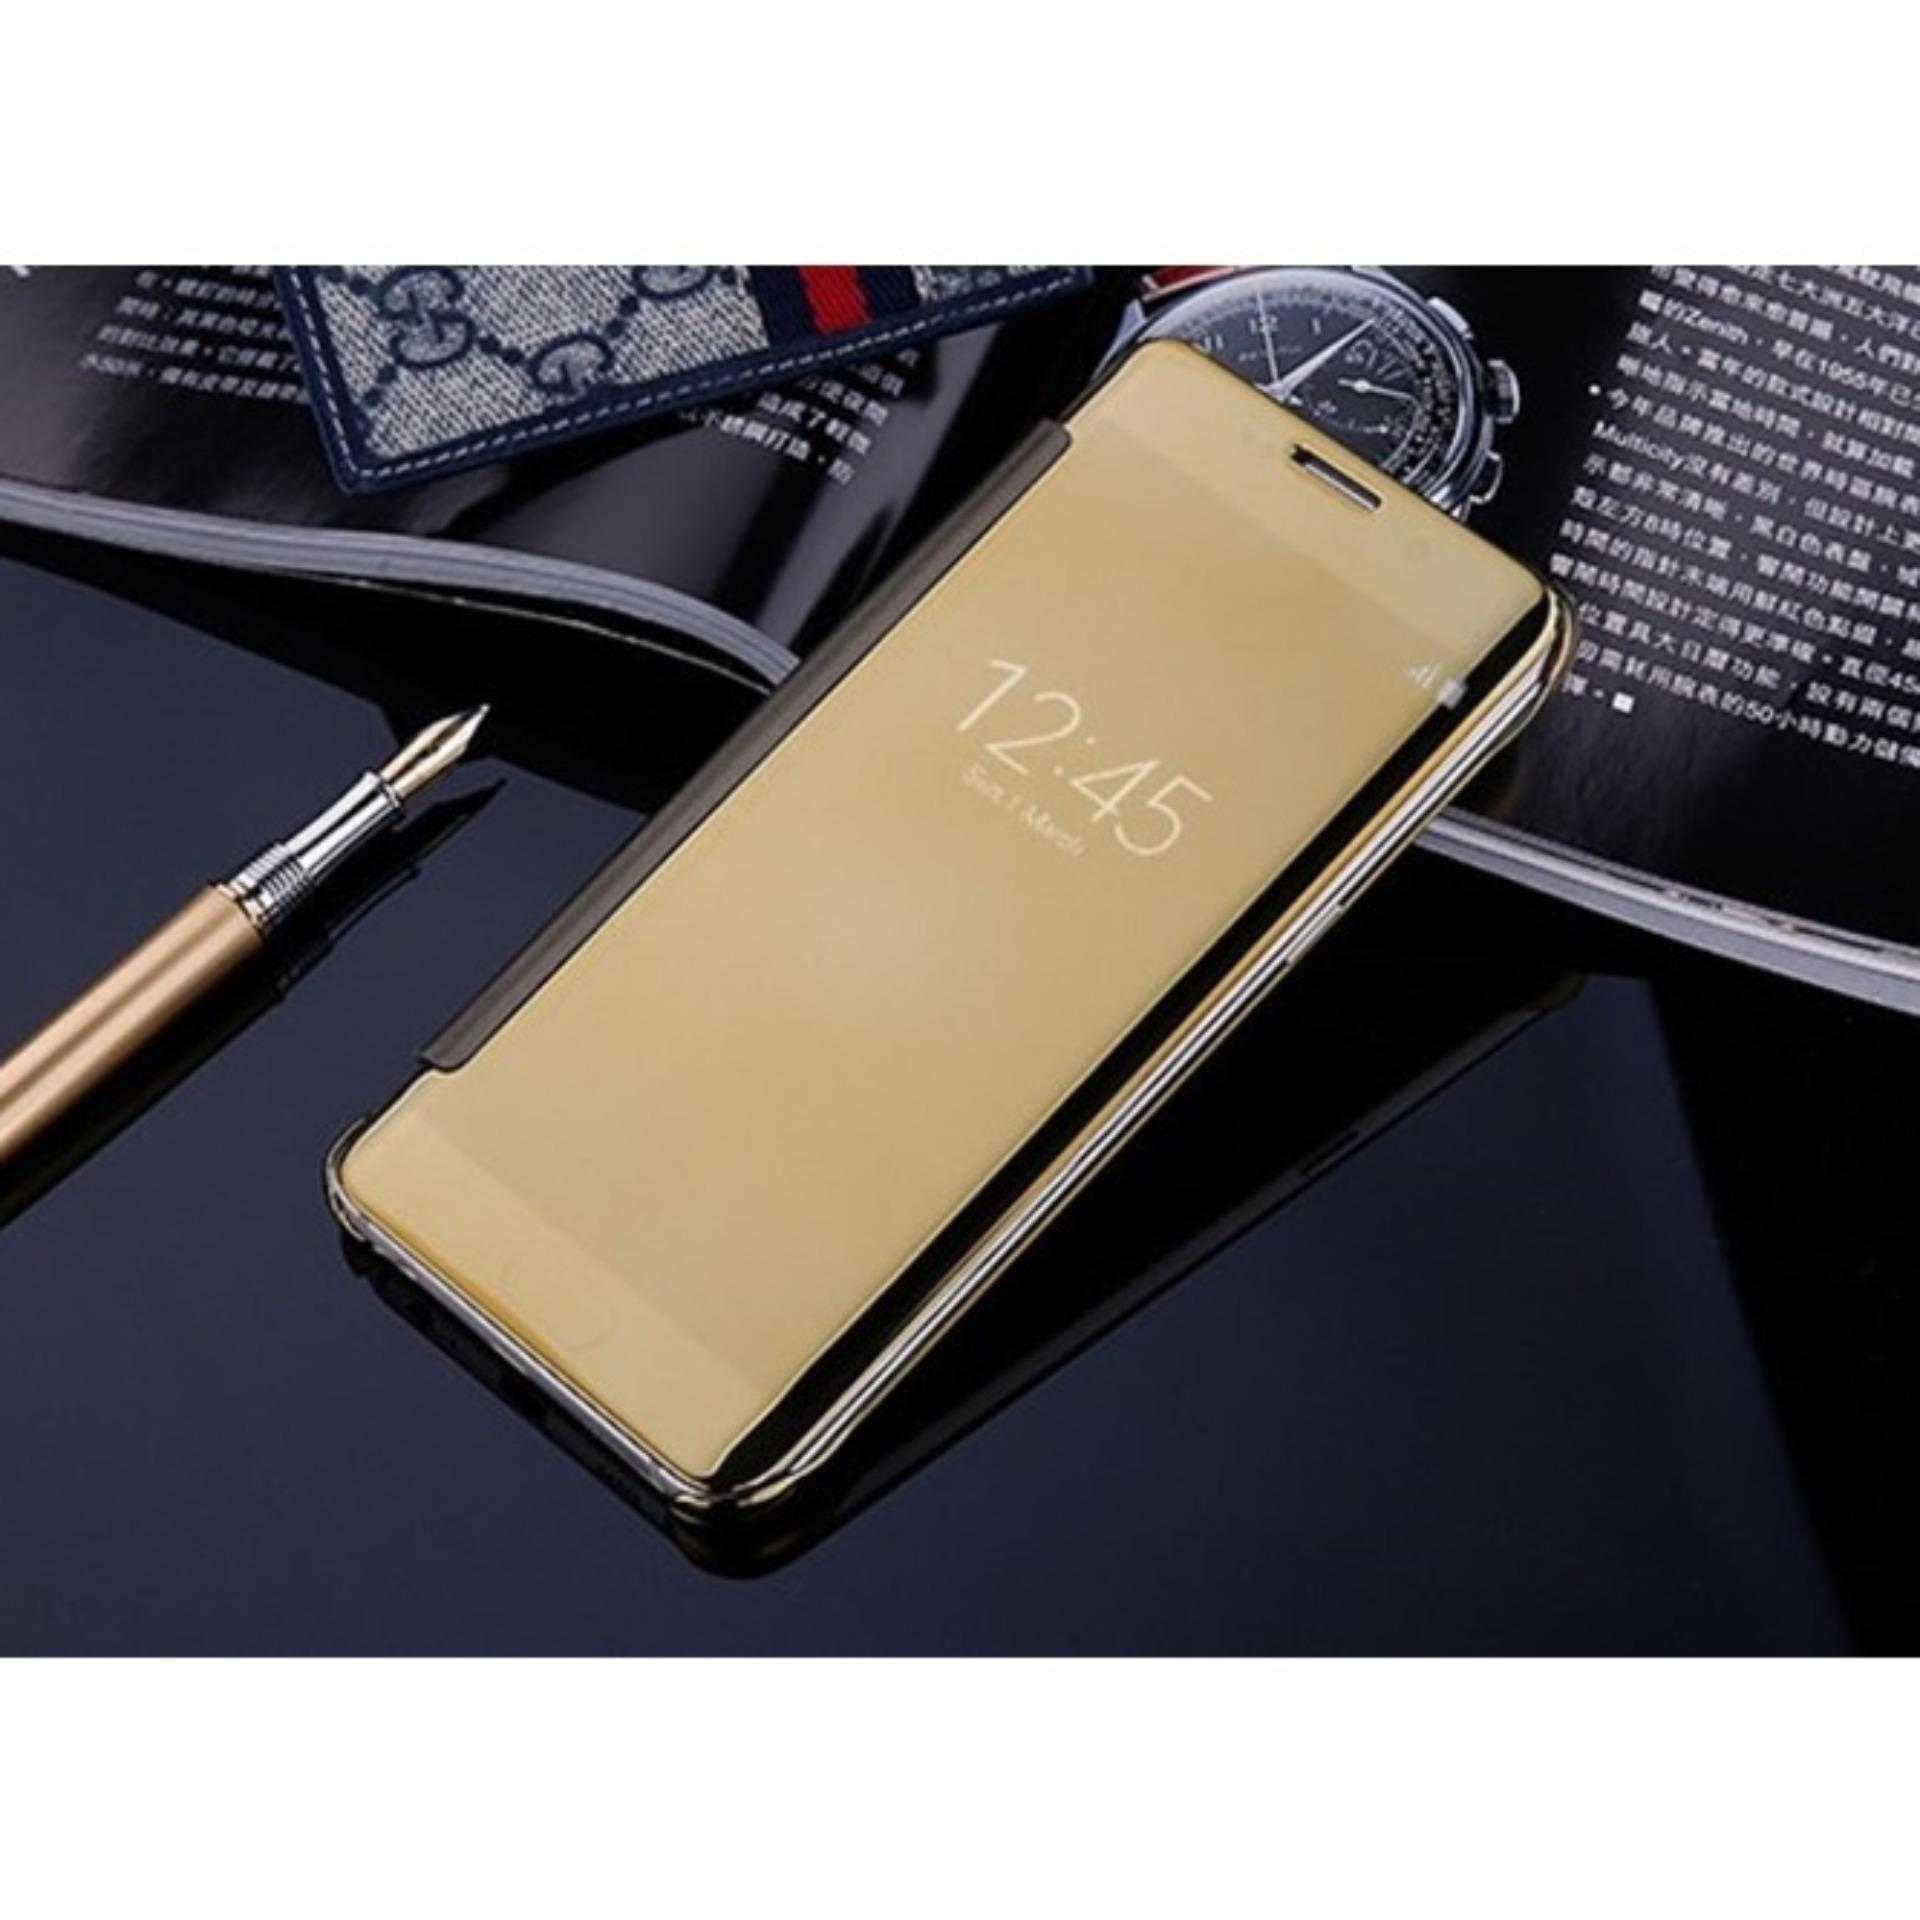 Samsung J7 Prime Flipcase Flip Mirror Cover S View Transparan AutoLock Casing Hp-Gold